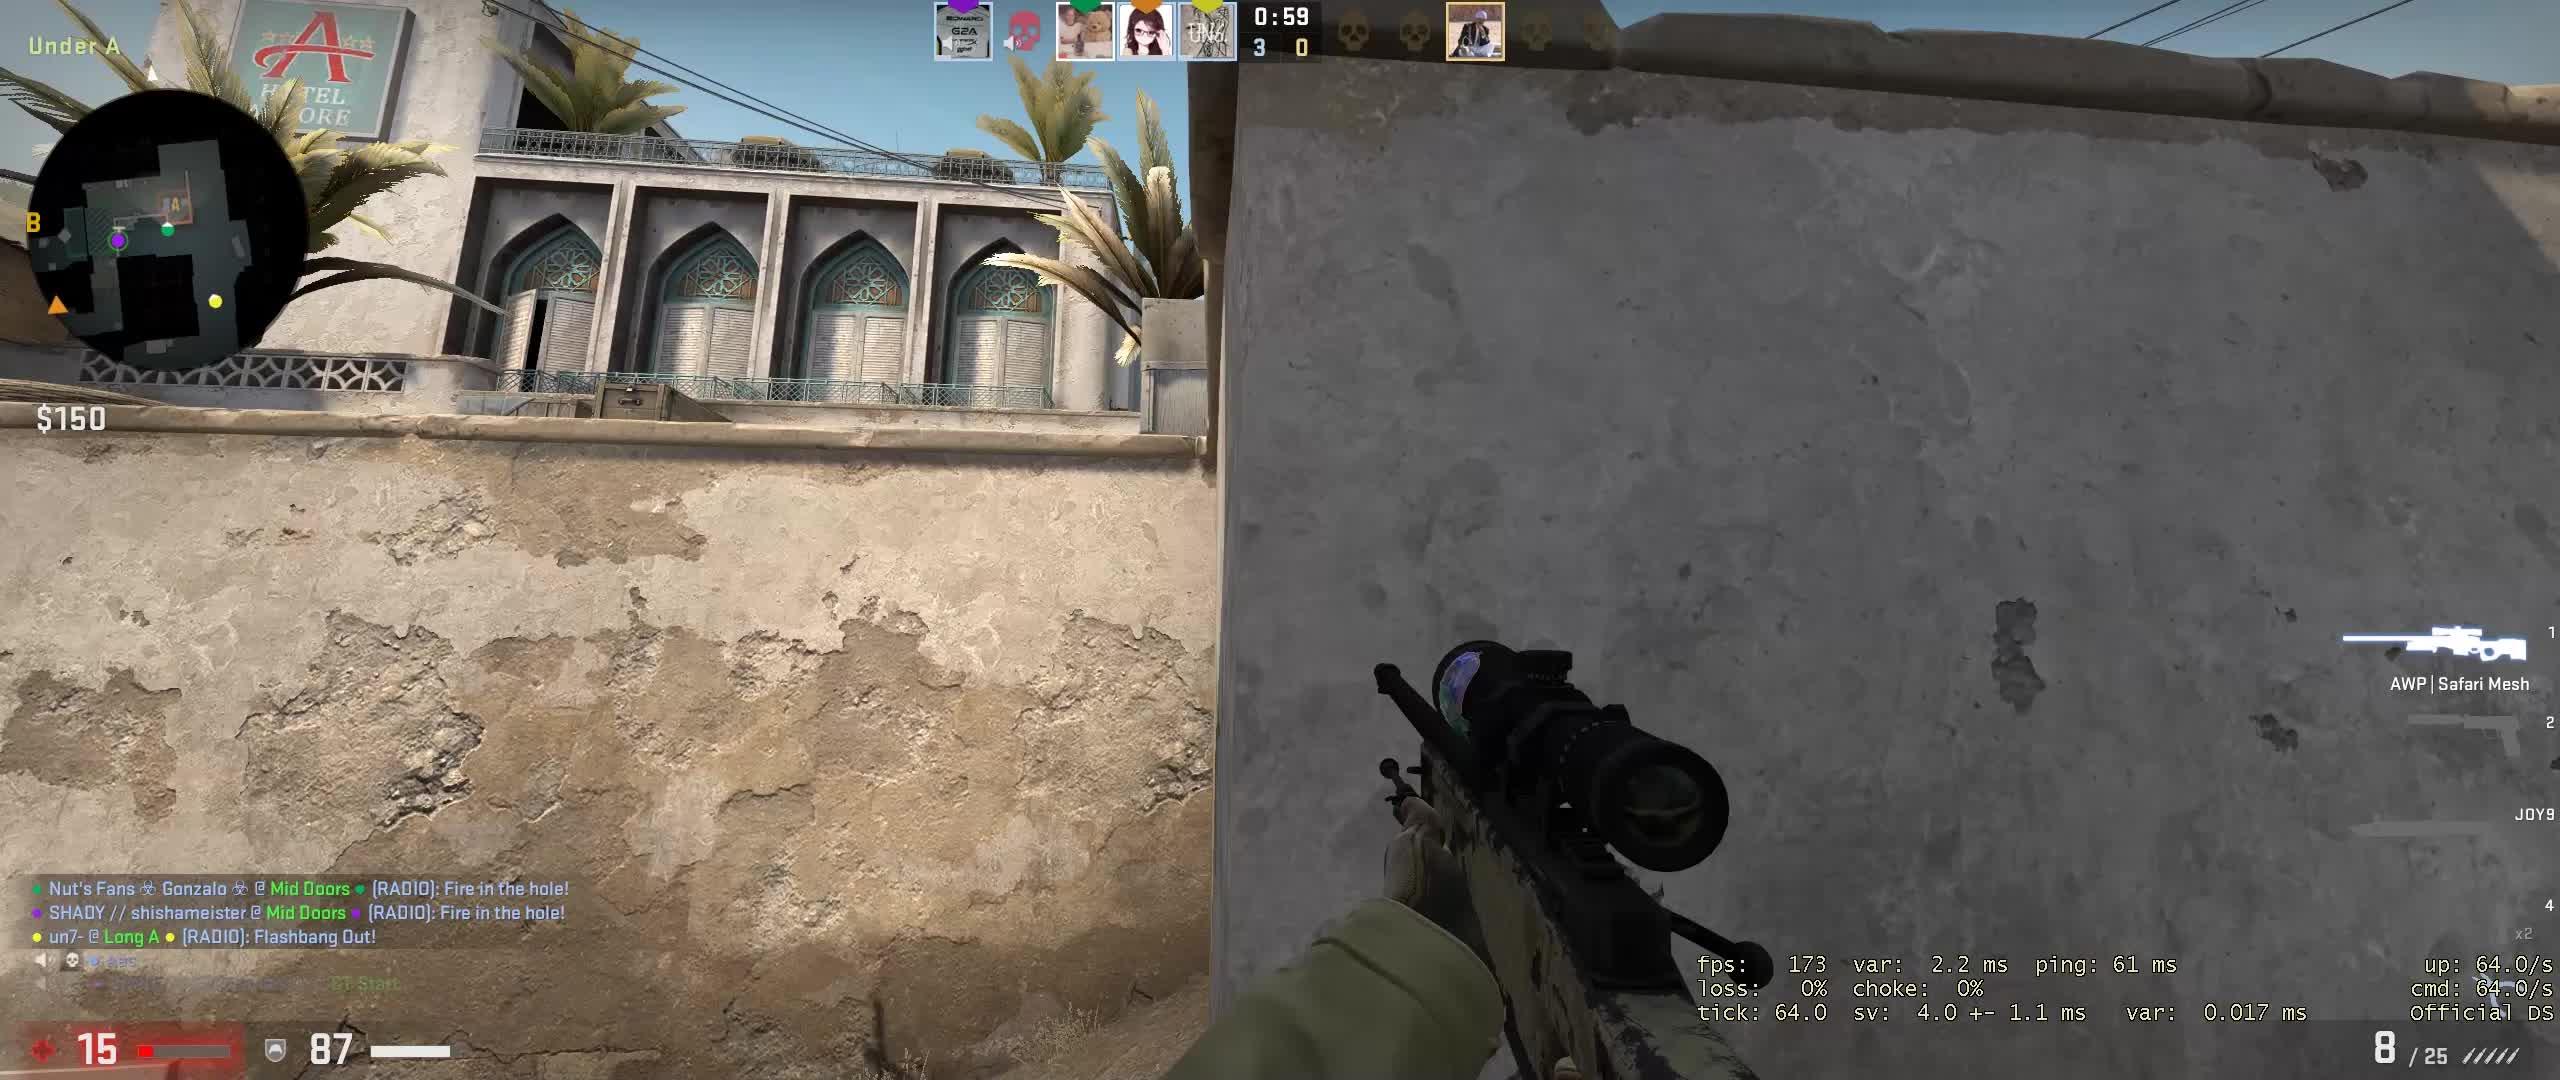 awp, csgo, kqly, shot, CS:GO KQLY shot conspiracy GIFs